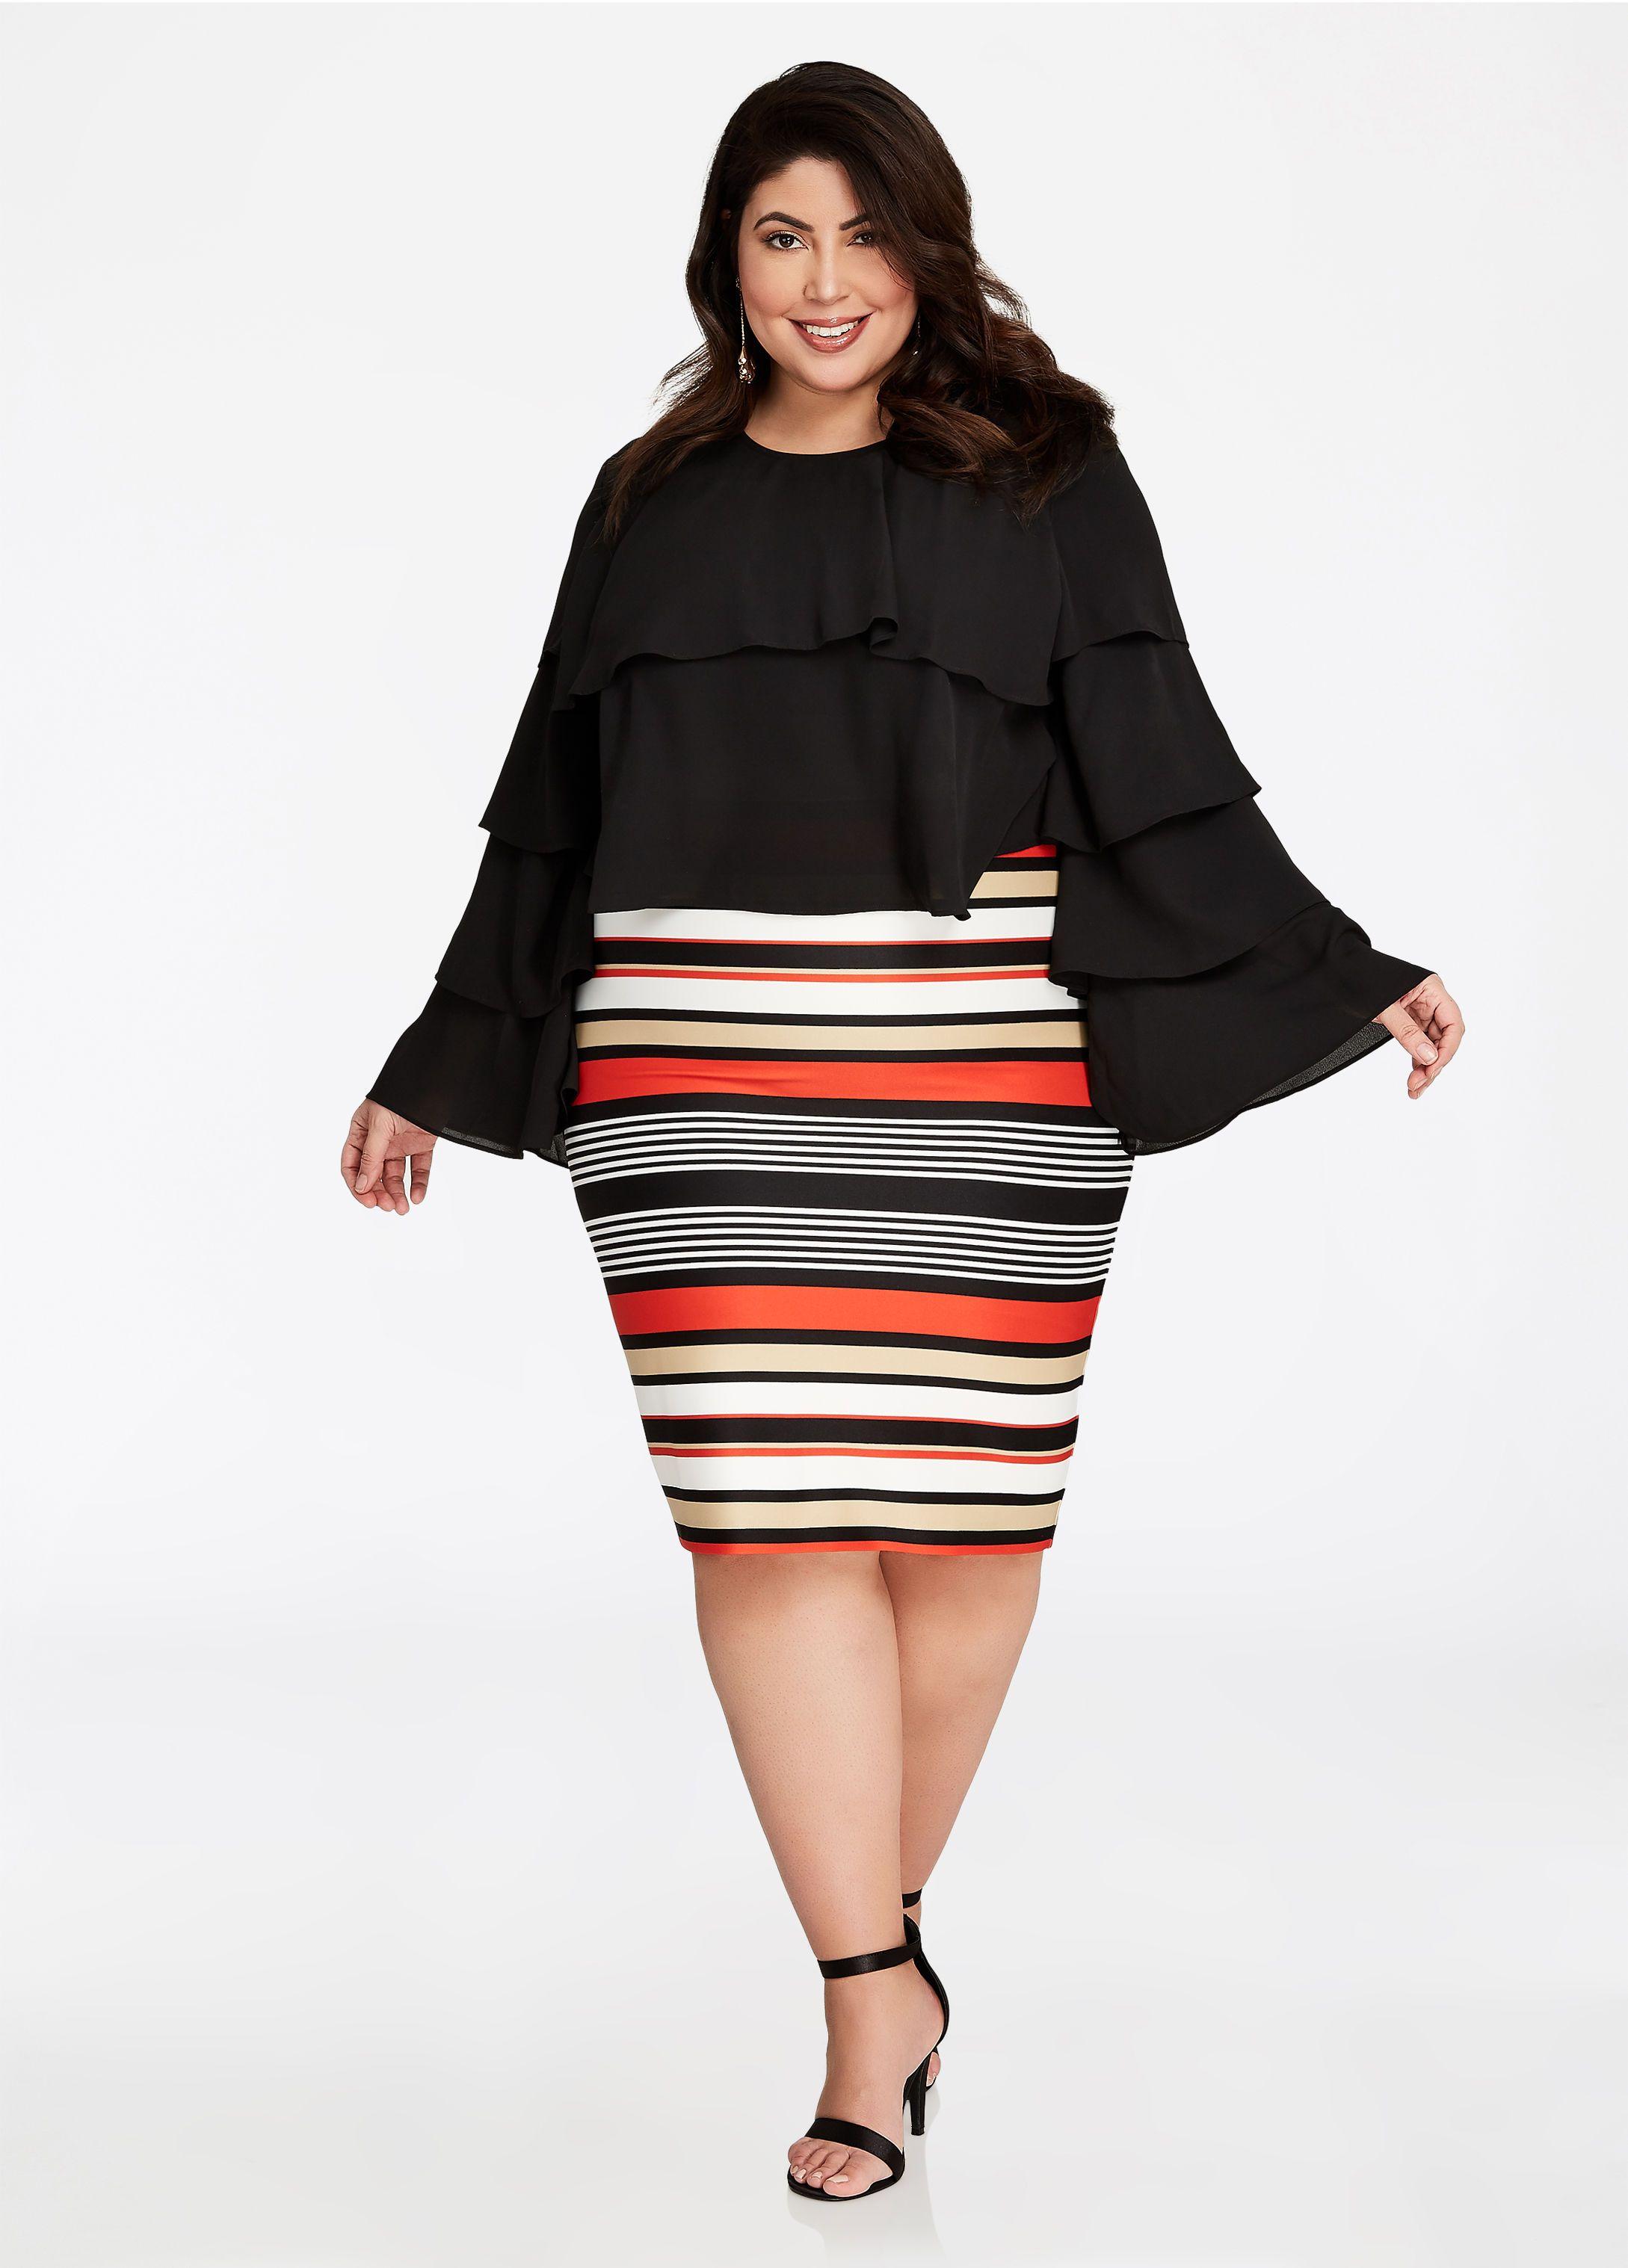 e3ed18d2b5f5 Multi Color Striped Pencil Skirt - Ashley Stewart